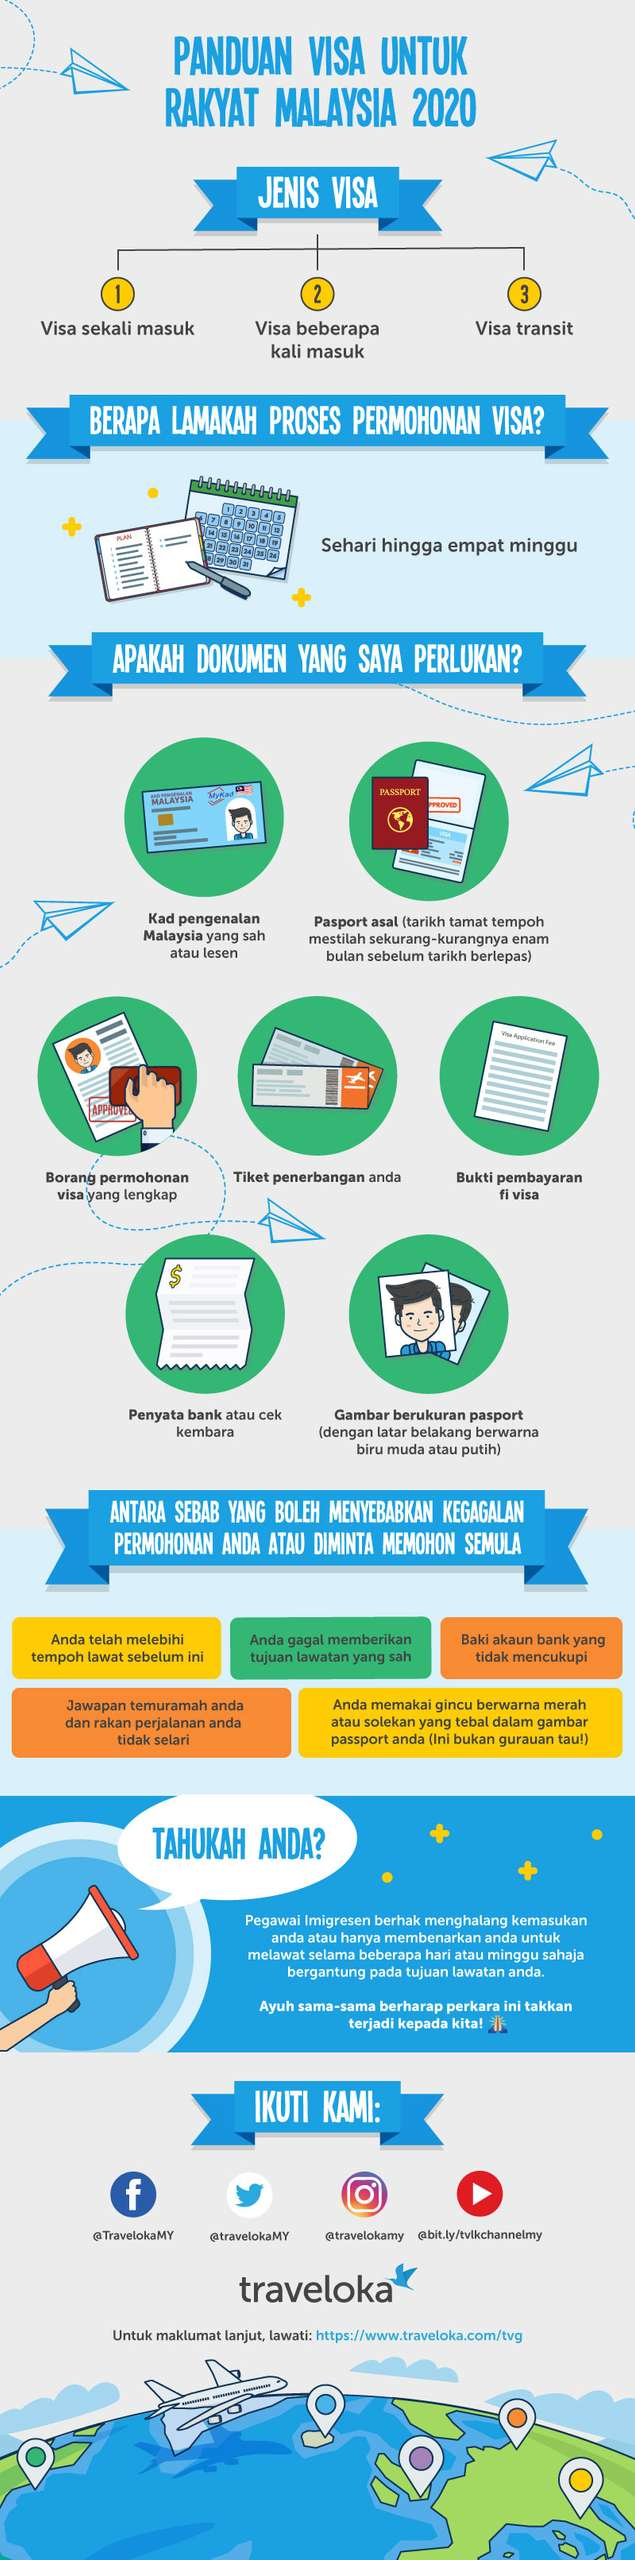 Infografik Panduan memohon visa untuk rakyat malaysia